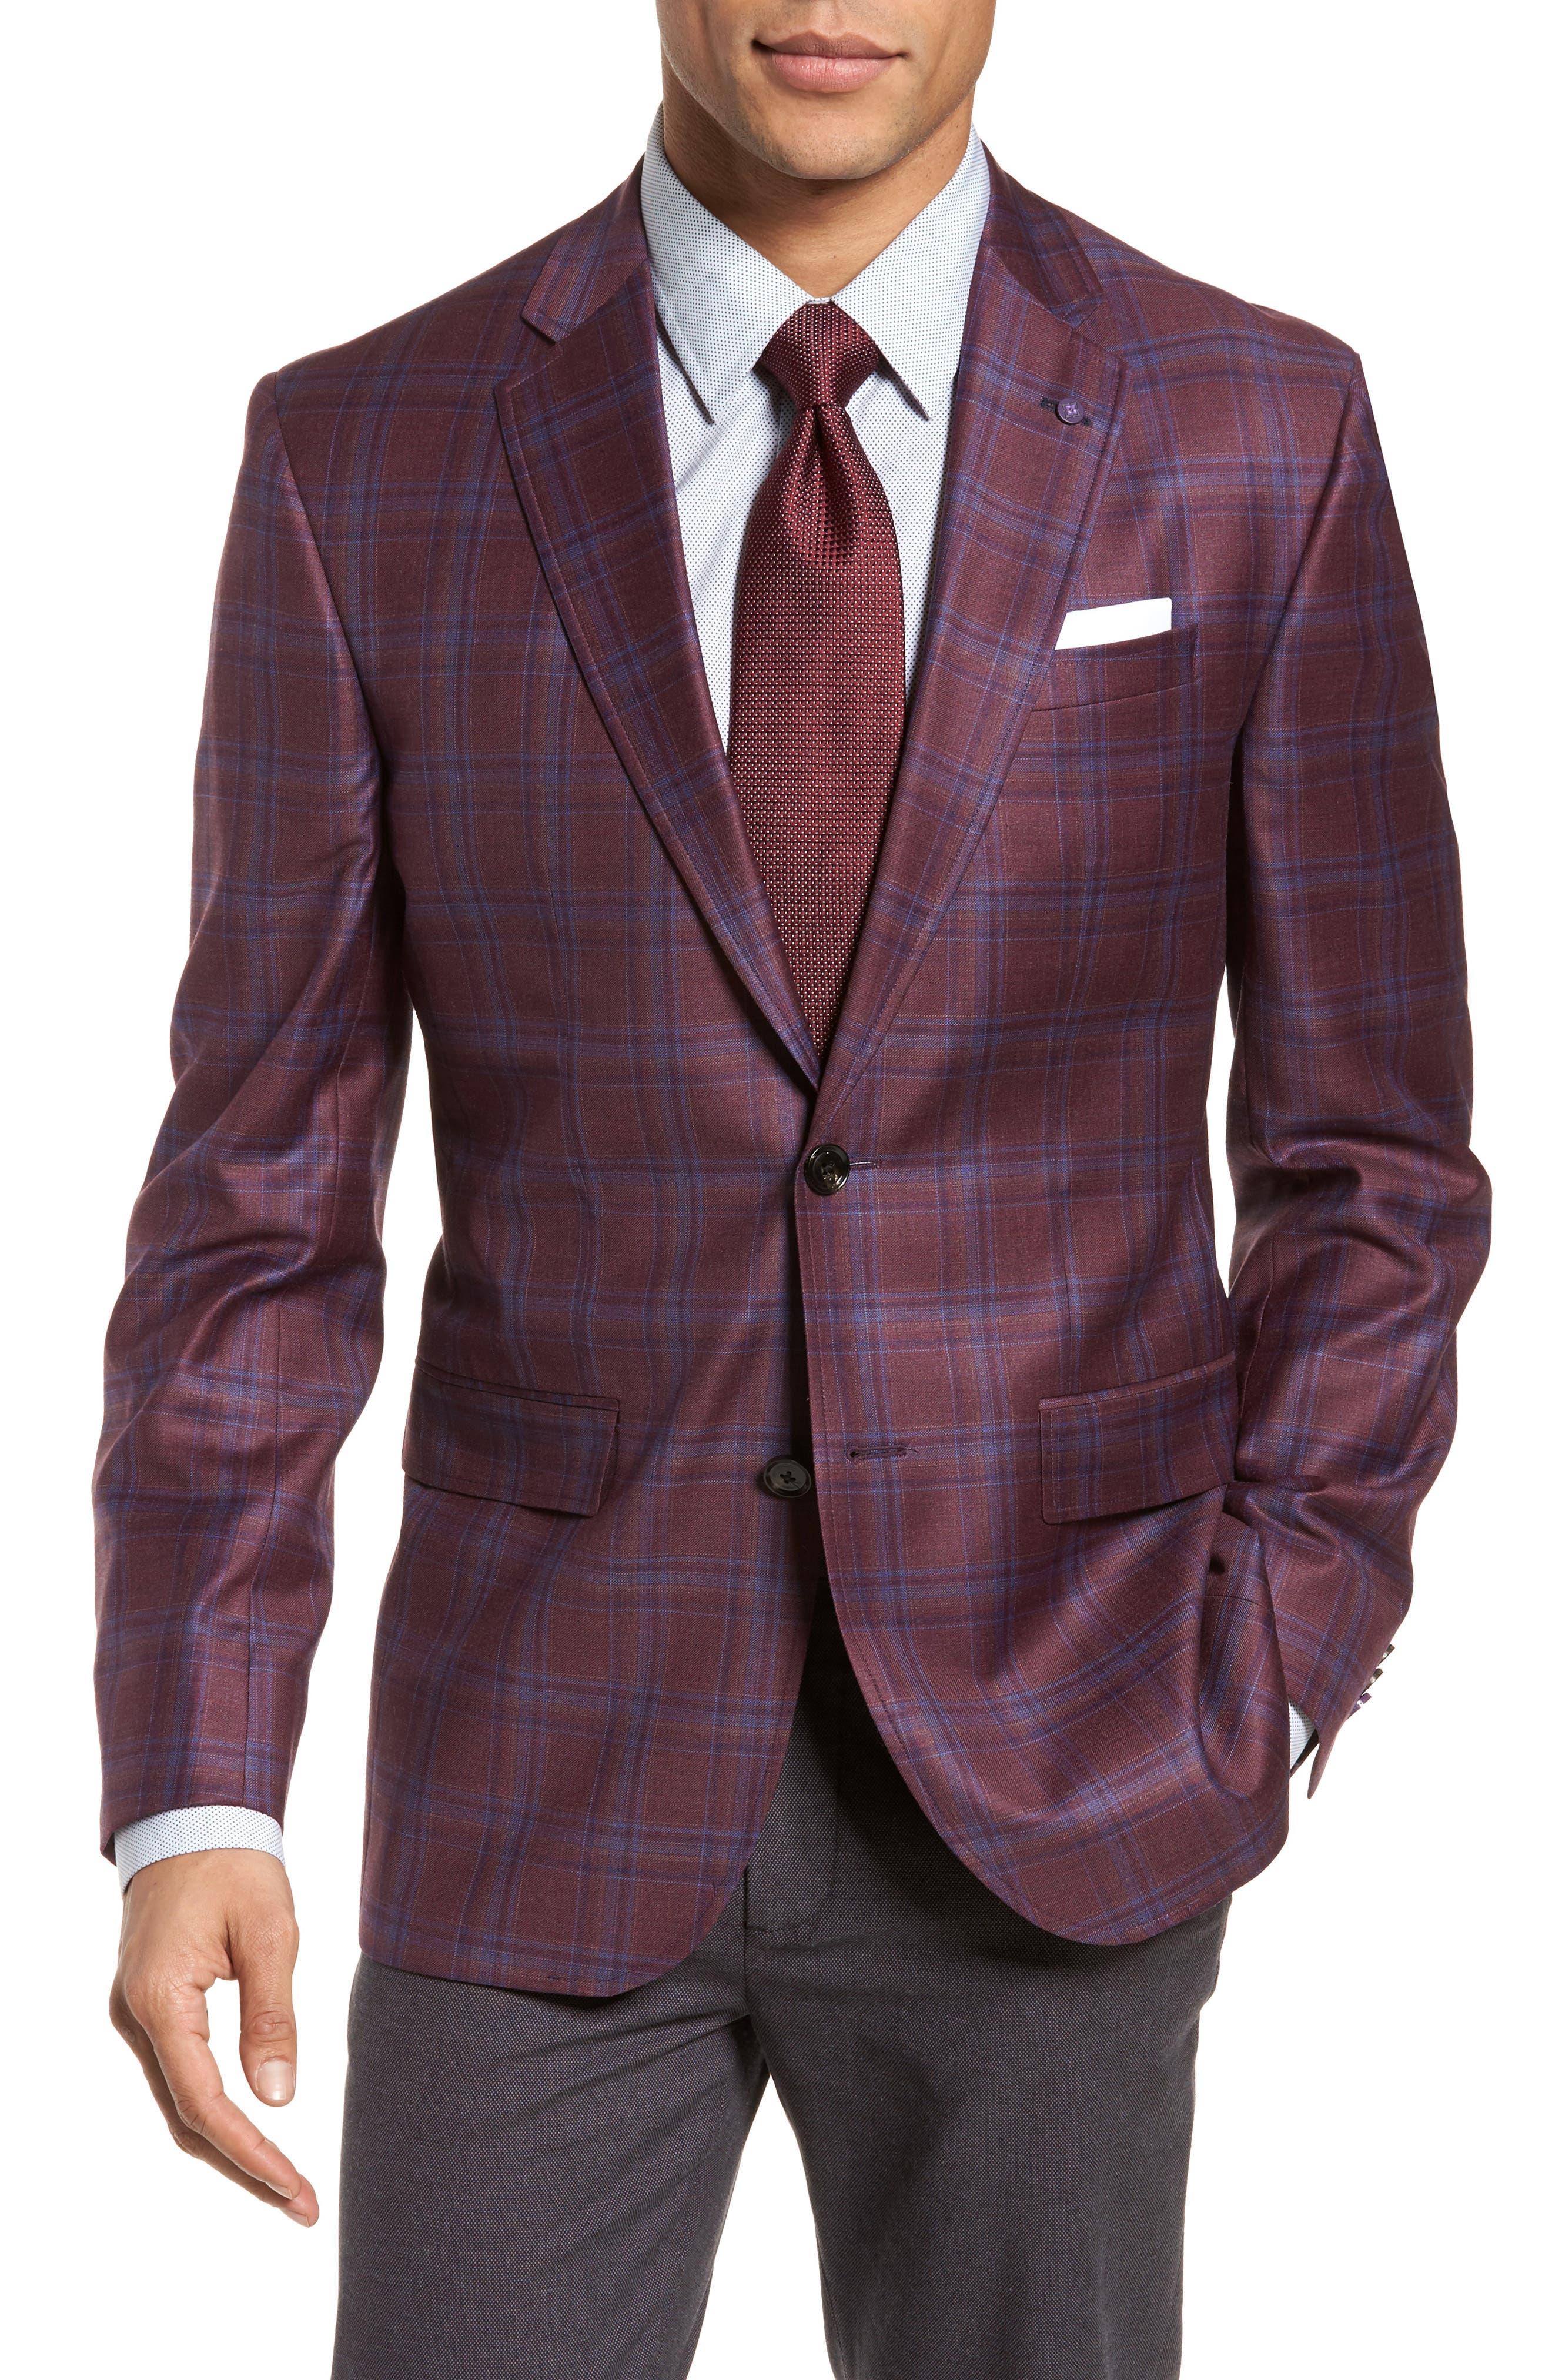 Jay Trim Fit Plaid Wool Sport Coat,                         Main,                         color, 600